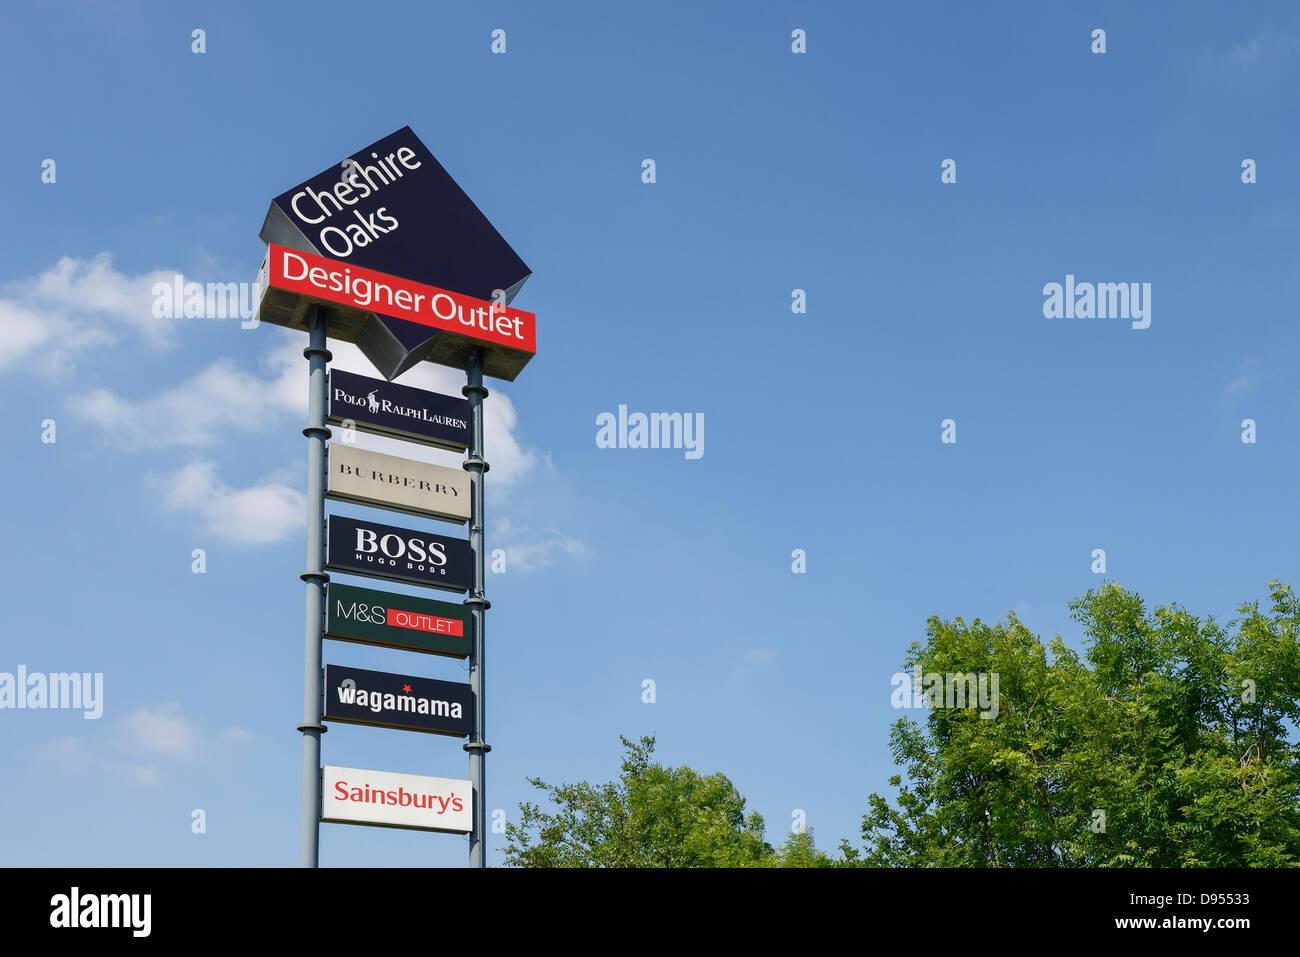 cheshire oaks designer outlet shopping centre ellesmere